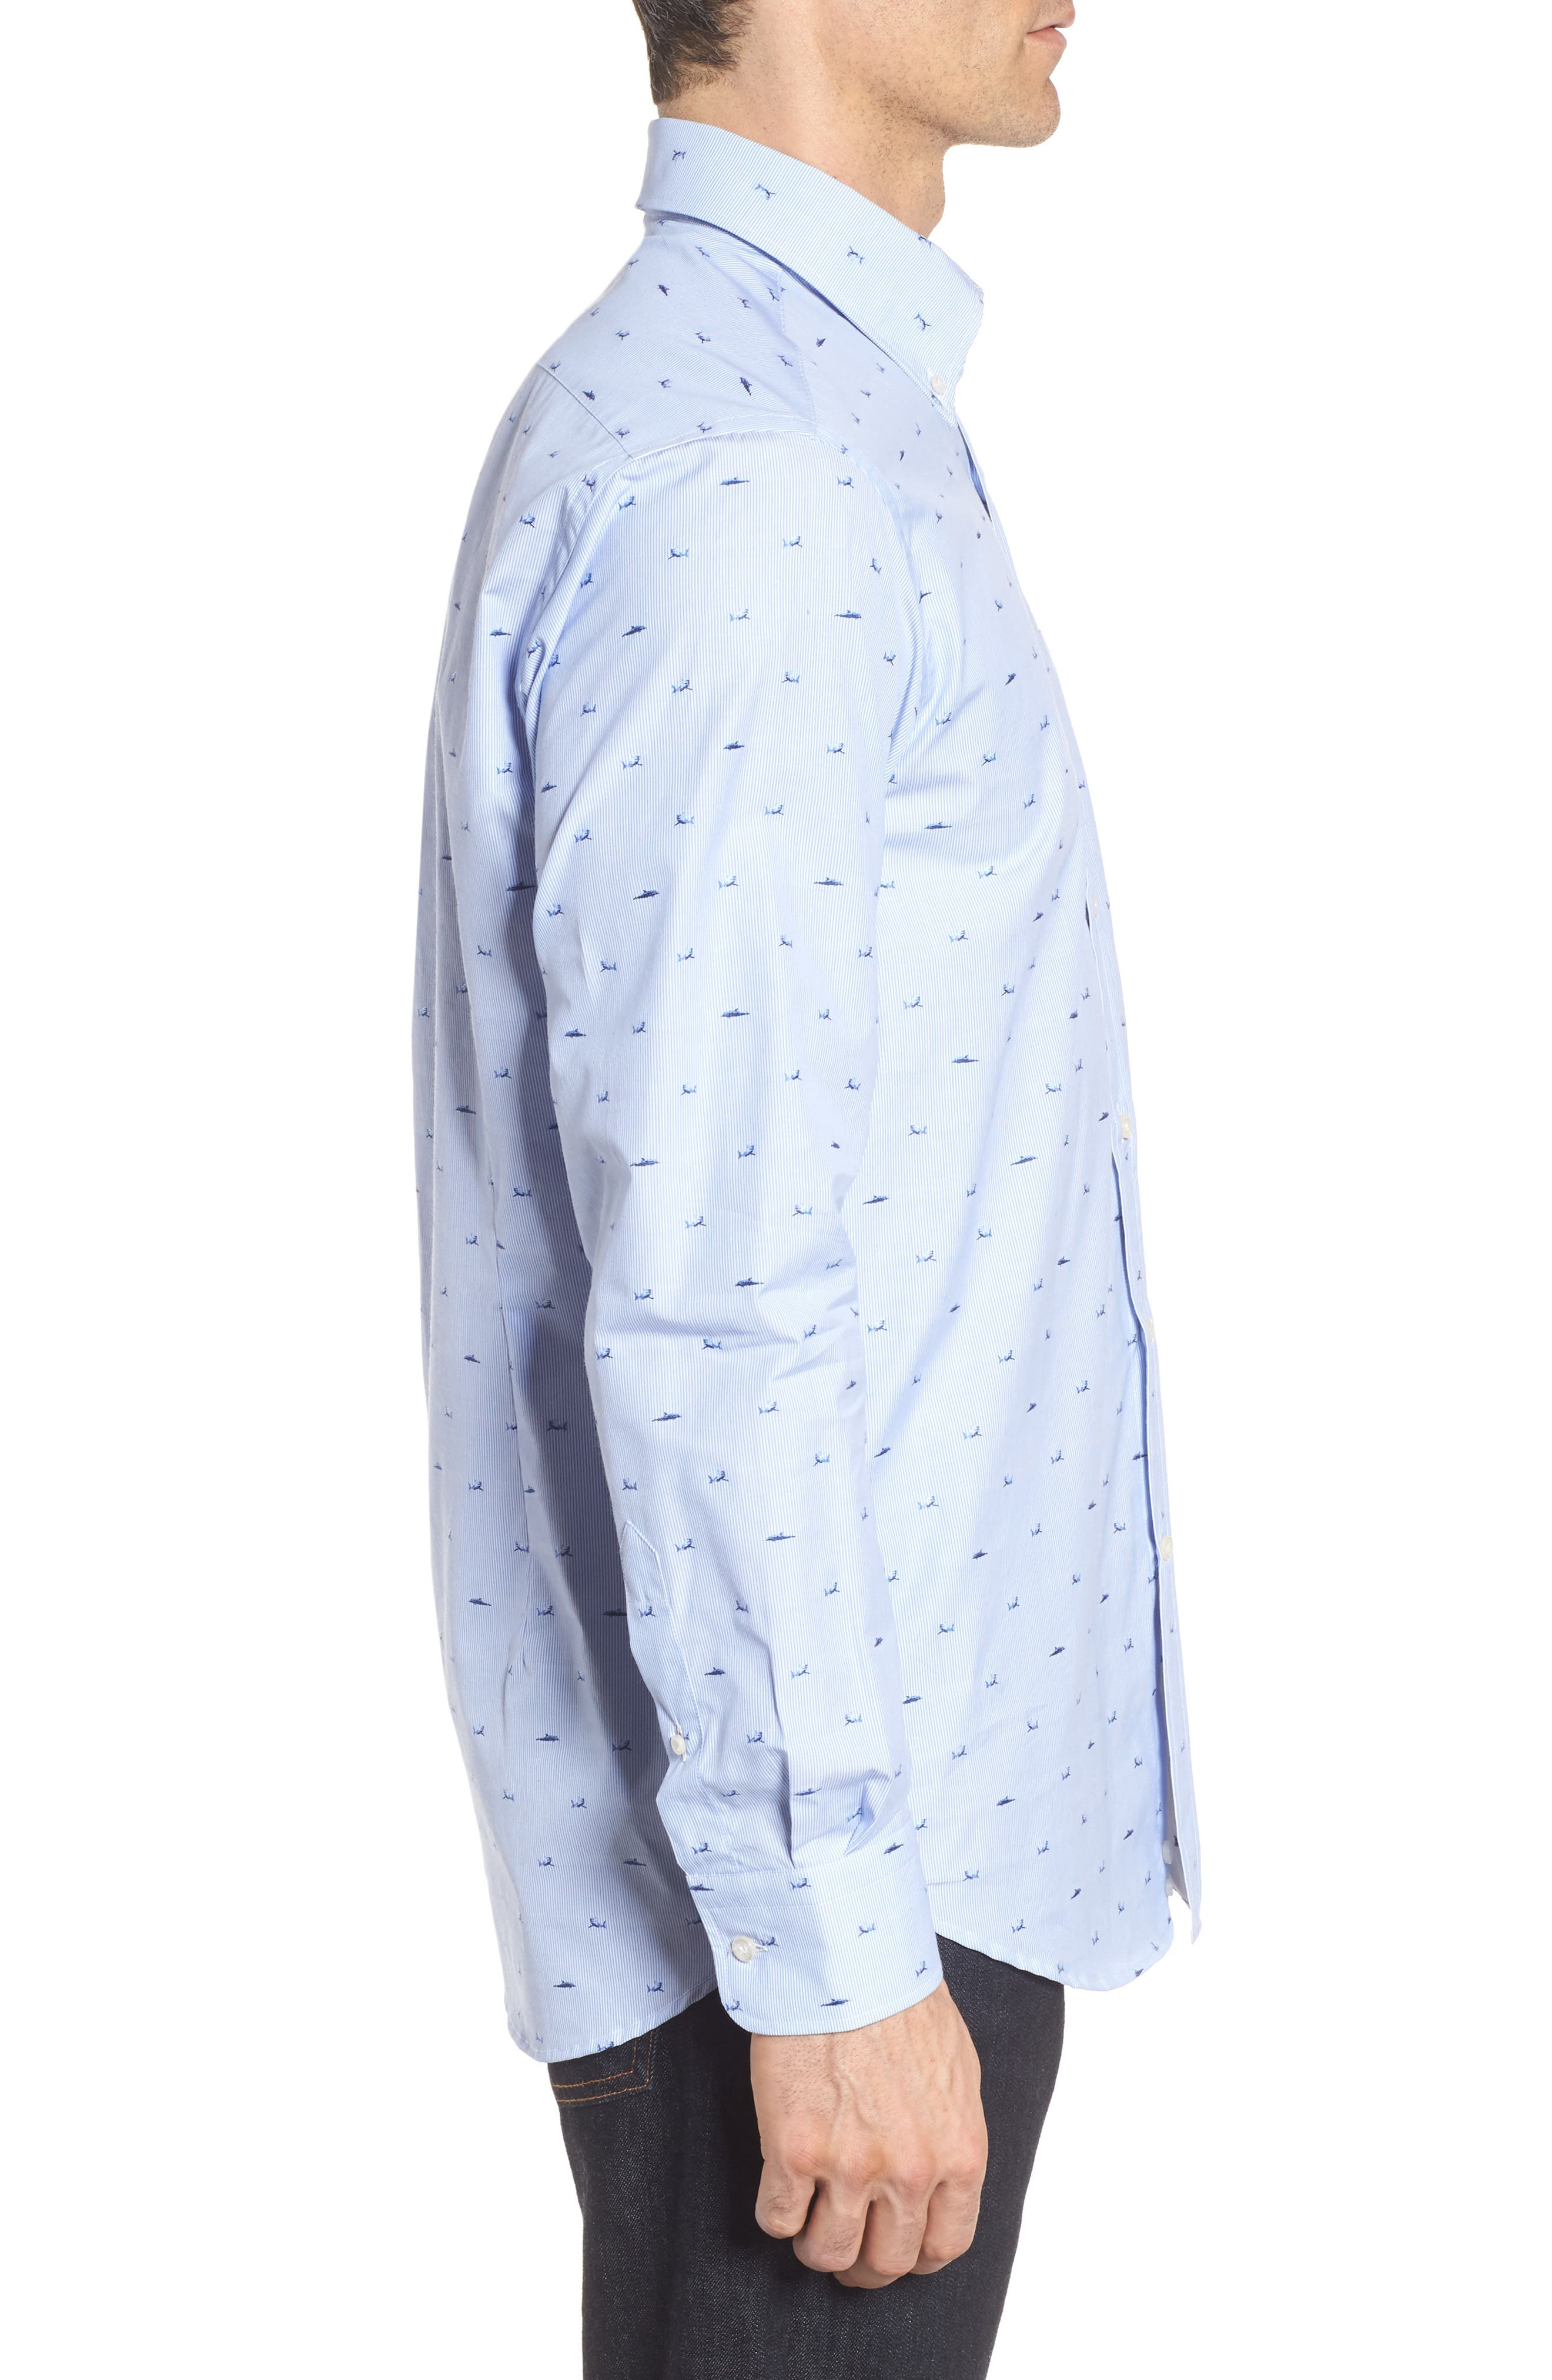 Paul&Shark Great White Jacquard Sport Shirt,                             Alternate thumbnail 3, color,